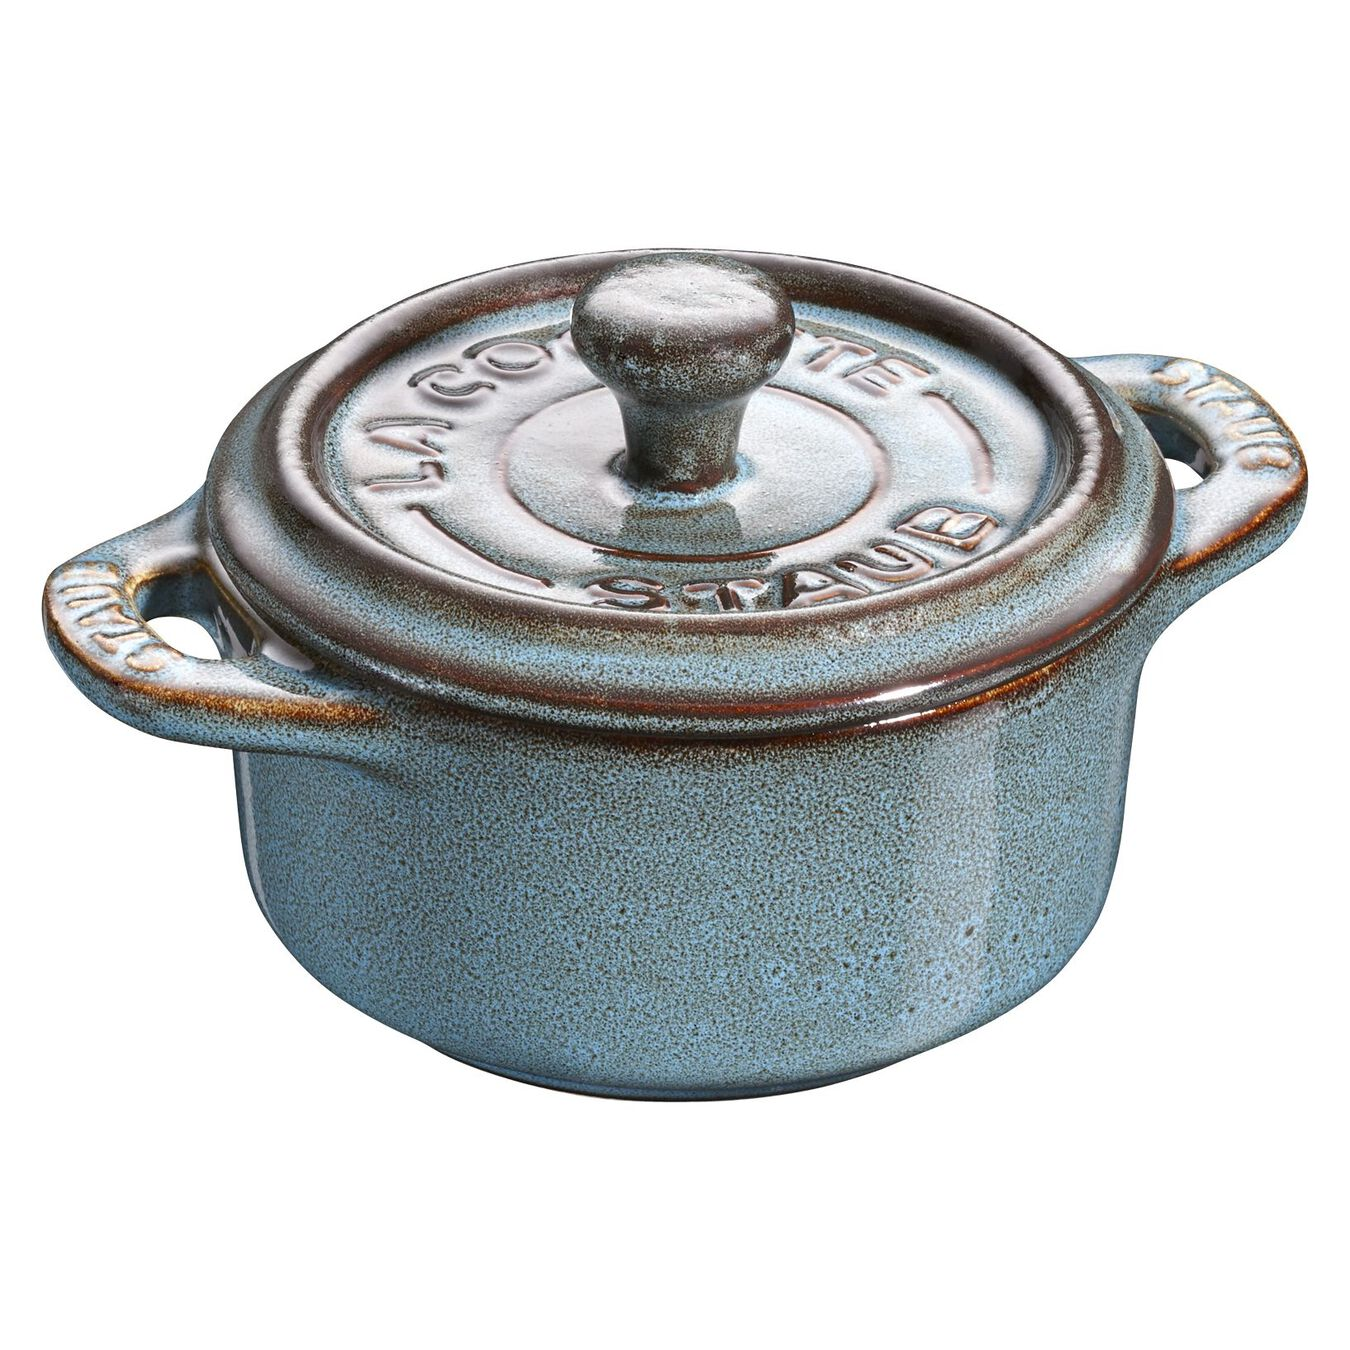 Mini cocotte rotonda - 10 cm, turchese antico,,large 1